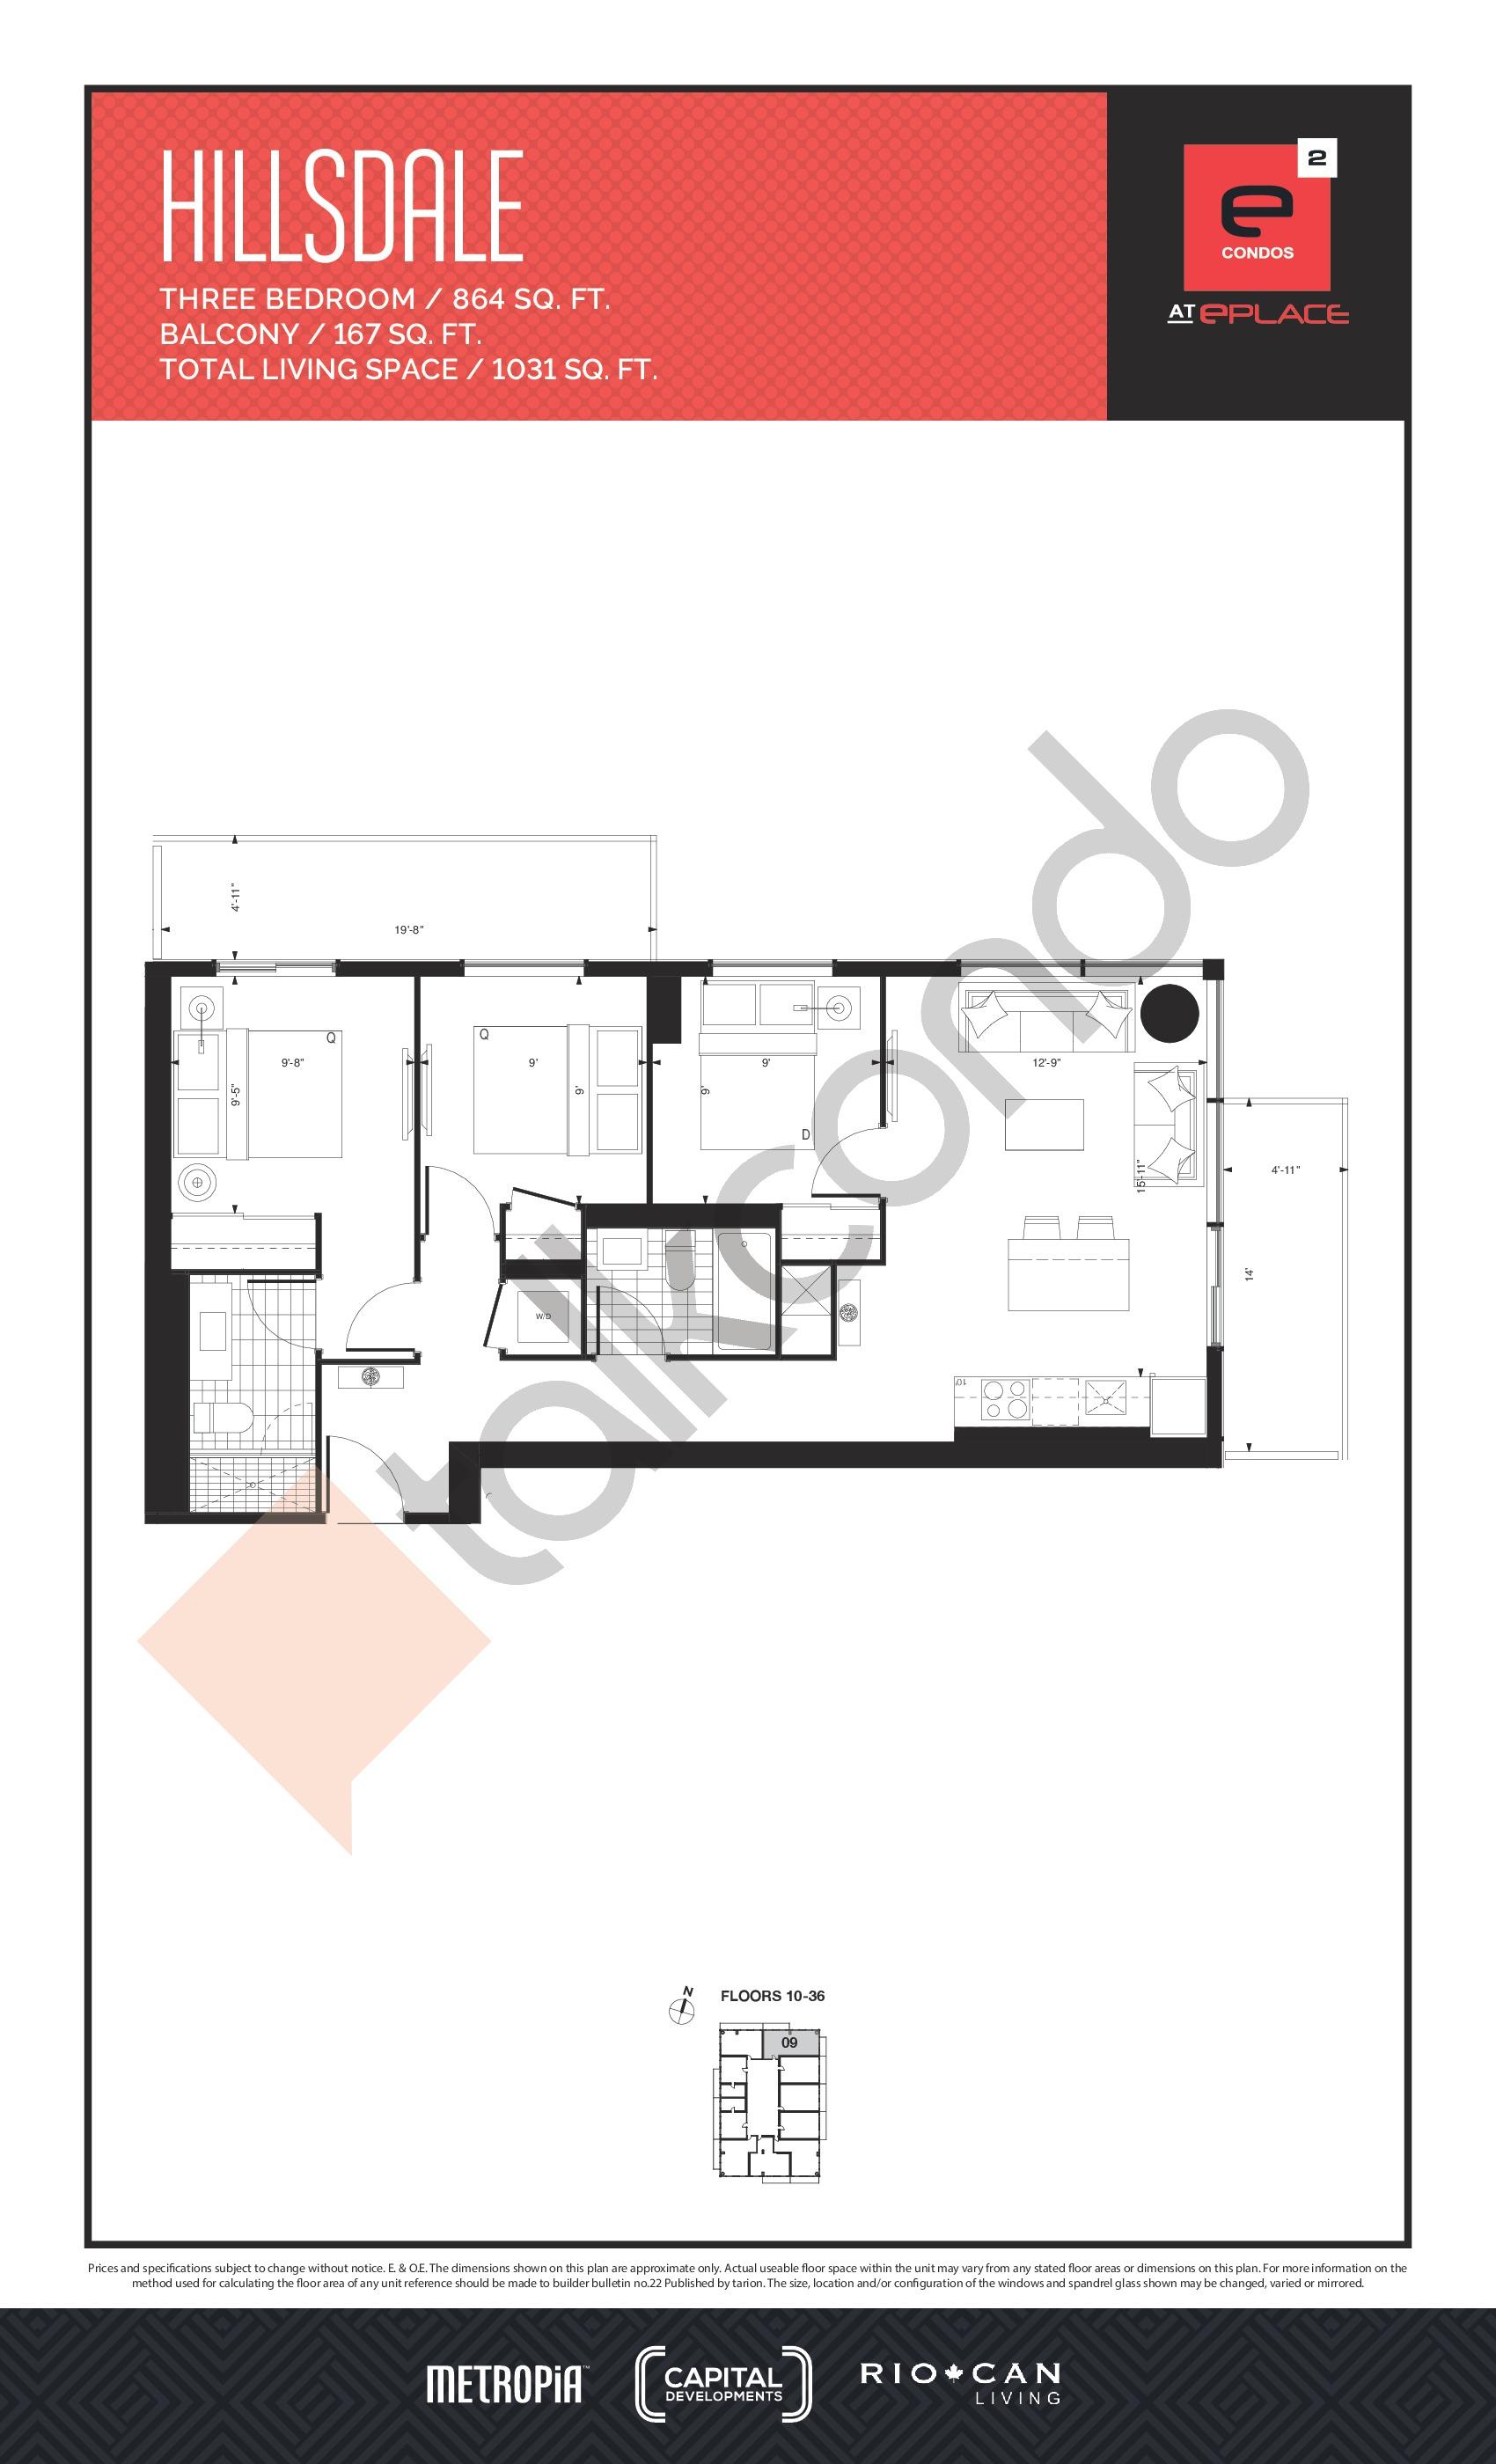 Hillsdale Floor Plan at E2 Condos - 864 sq.ft